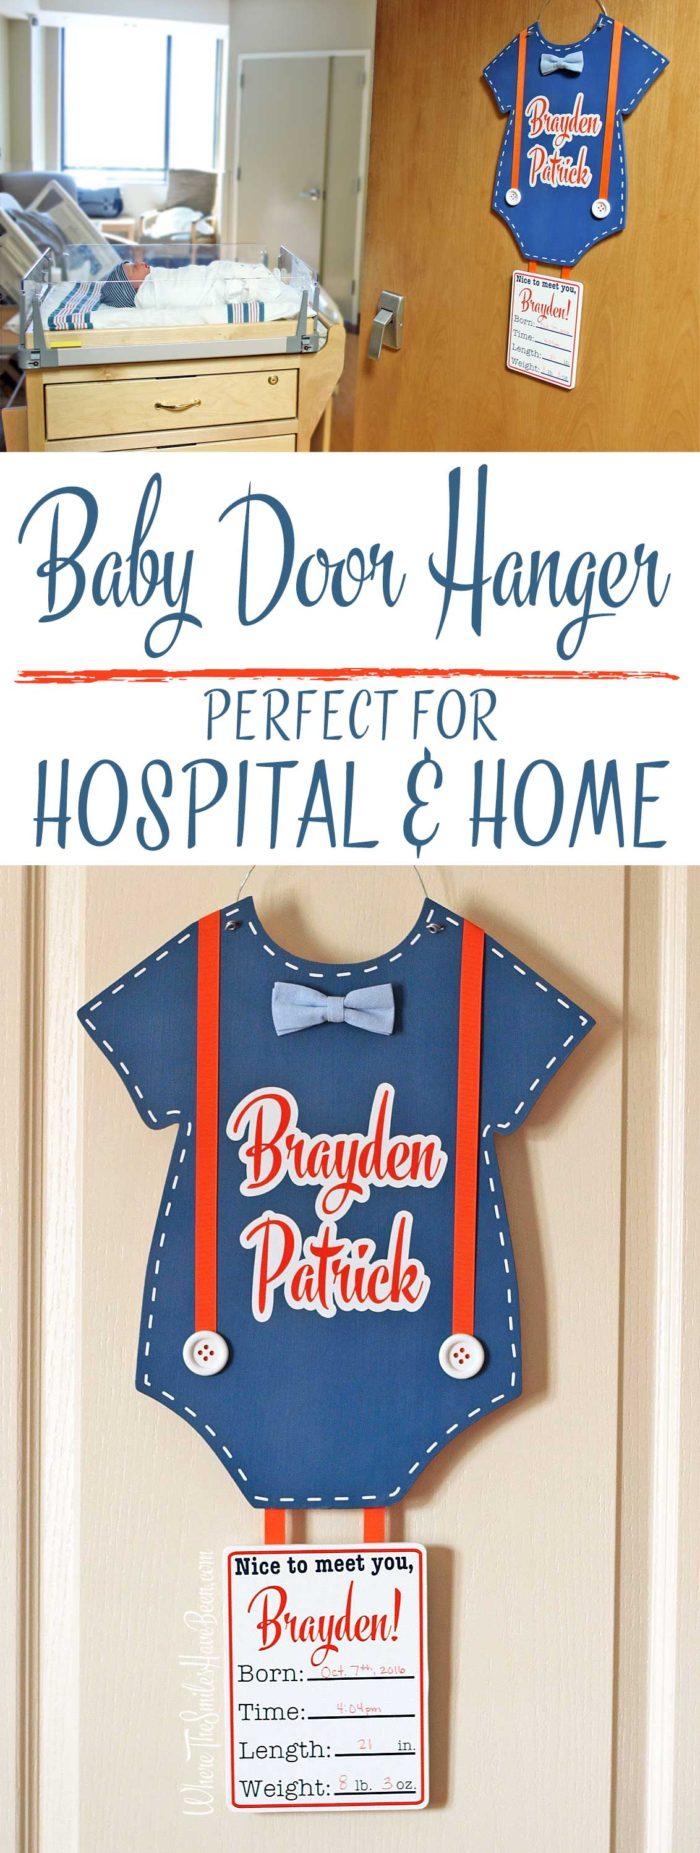 Personalized Baby Door Hanger for Hospital & Home.